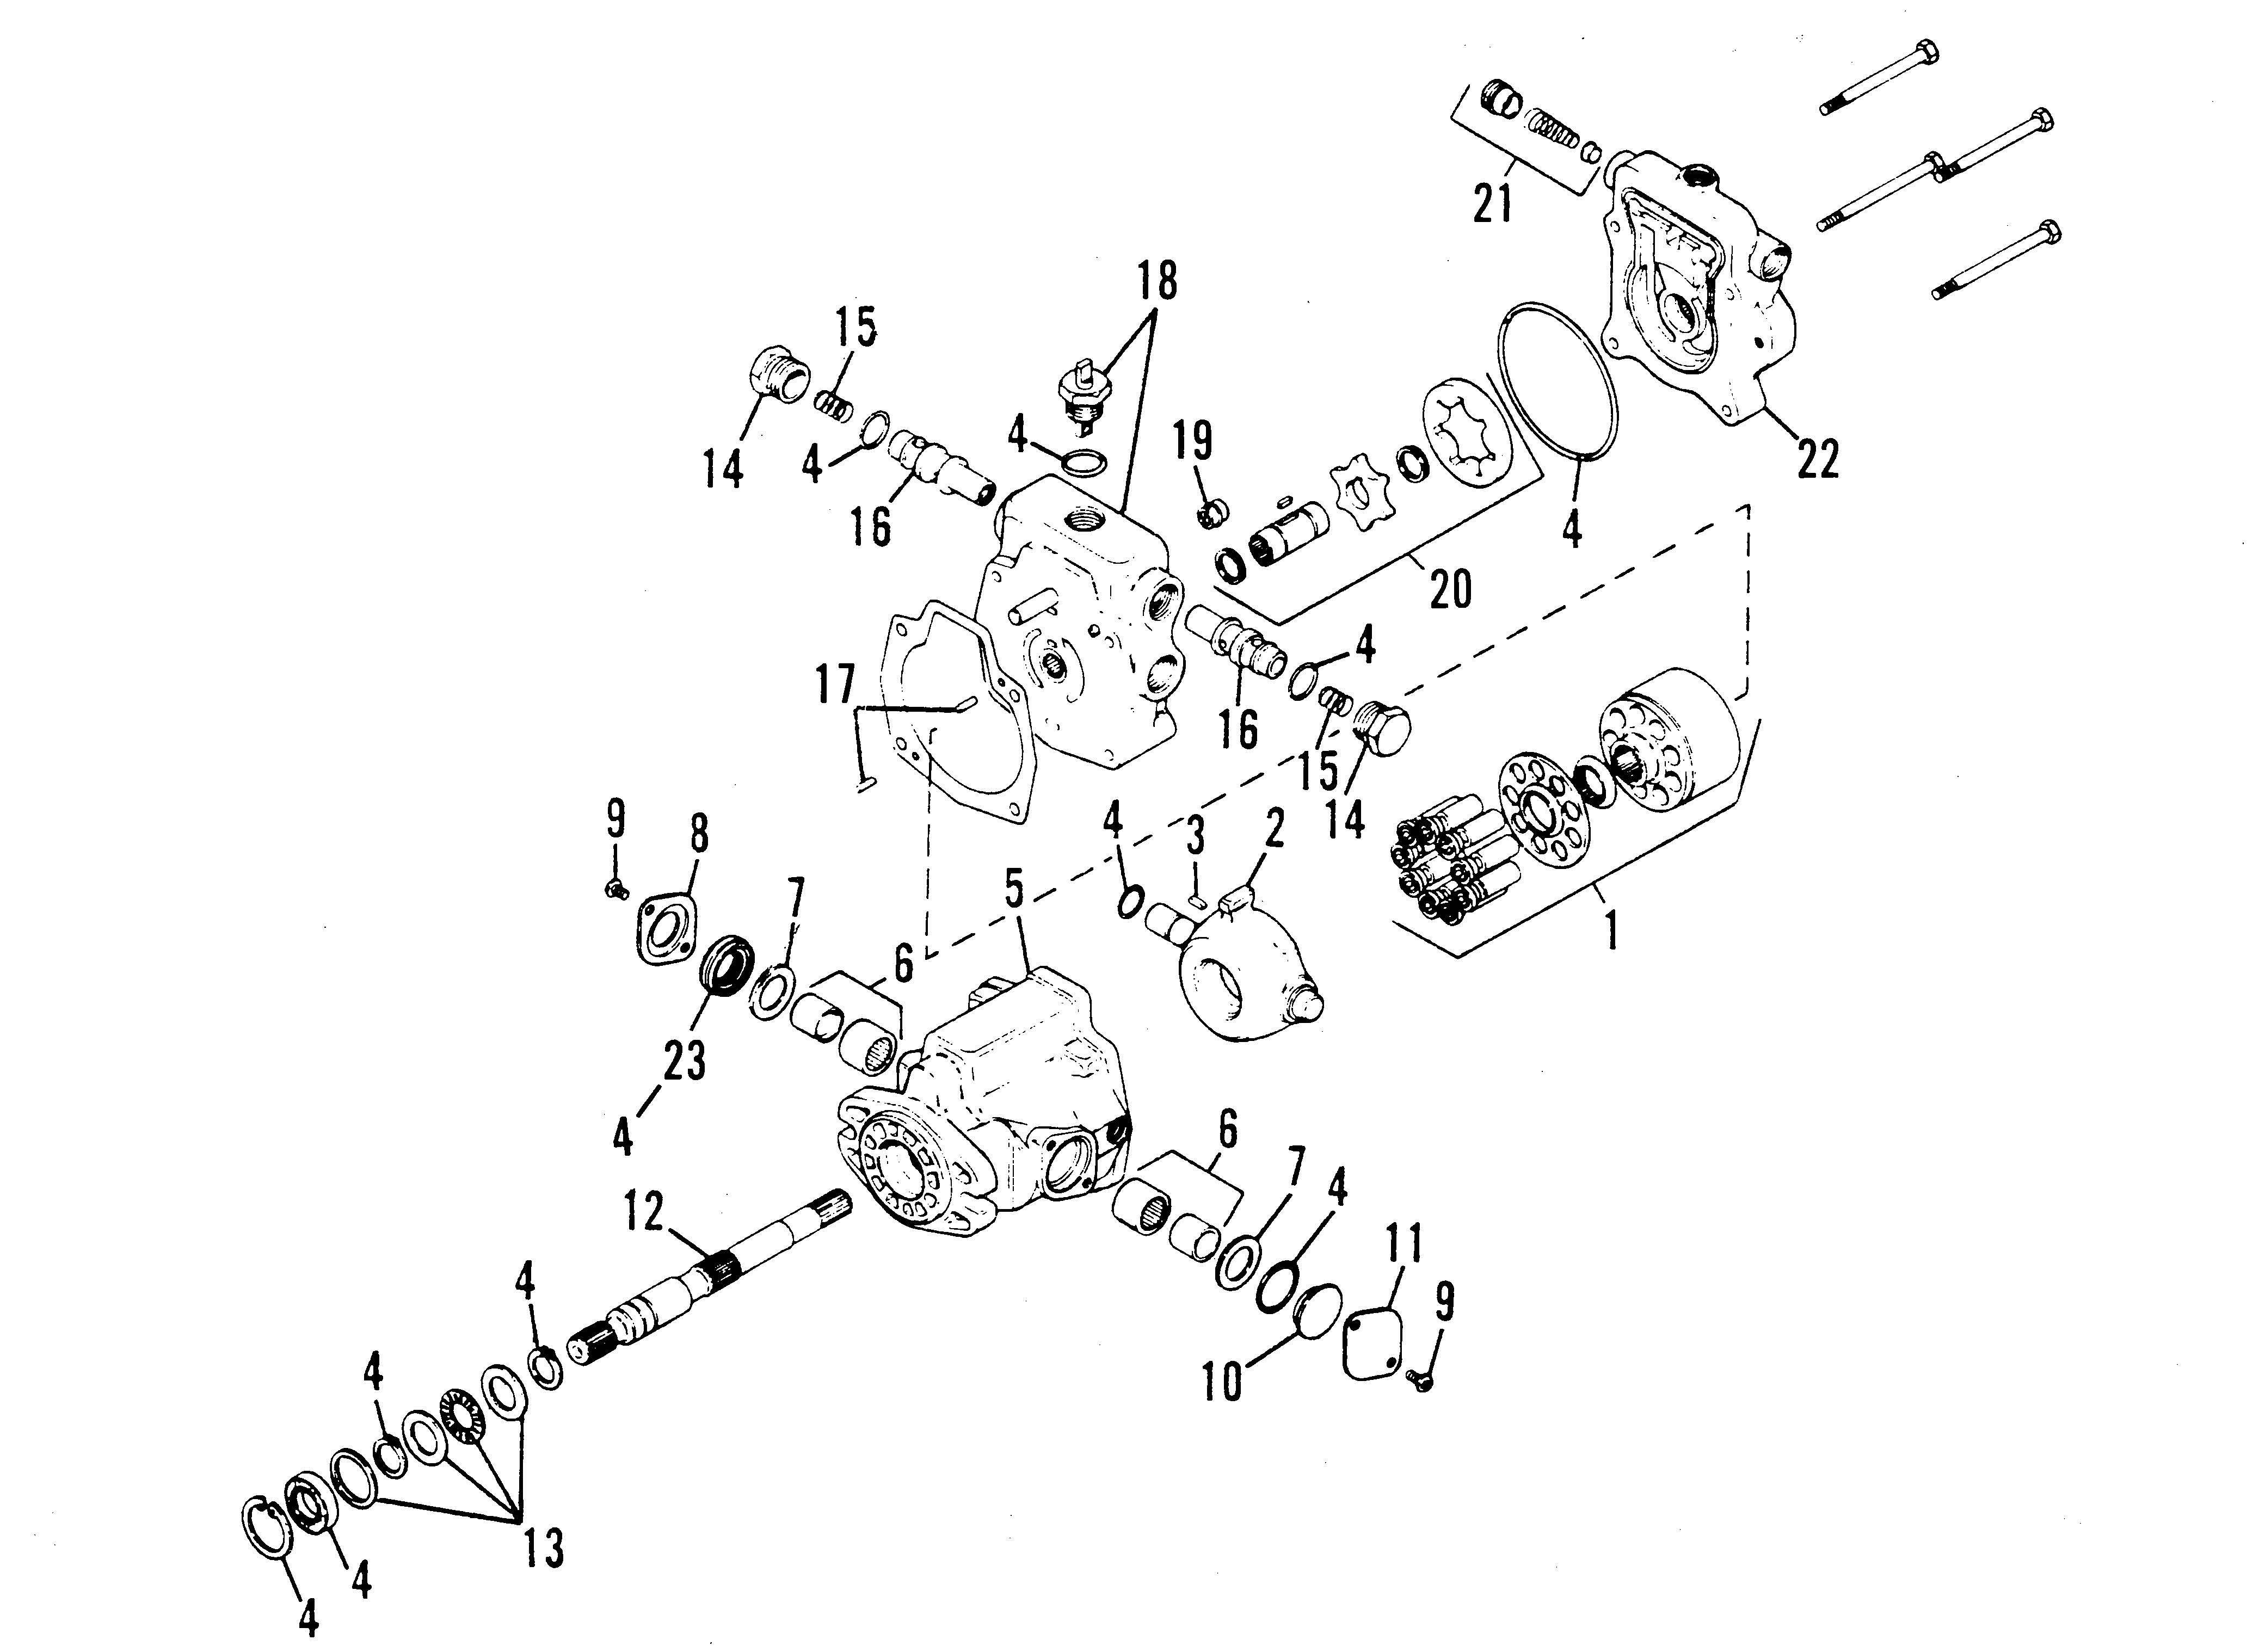 Gehl 4510 Wiring Diagram Harlo Wiring Diagram Sullair Wiring – Lull Alternator Wiring Diagram